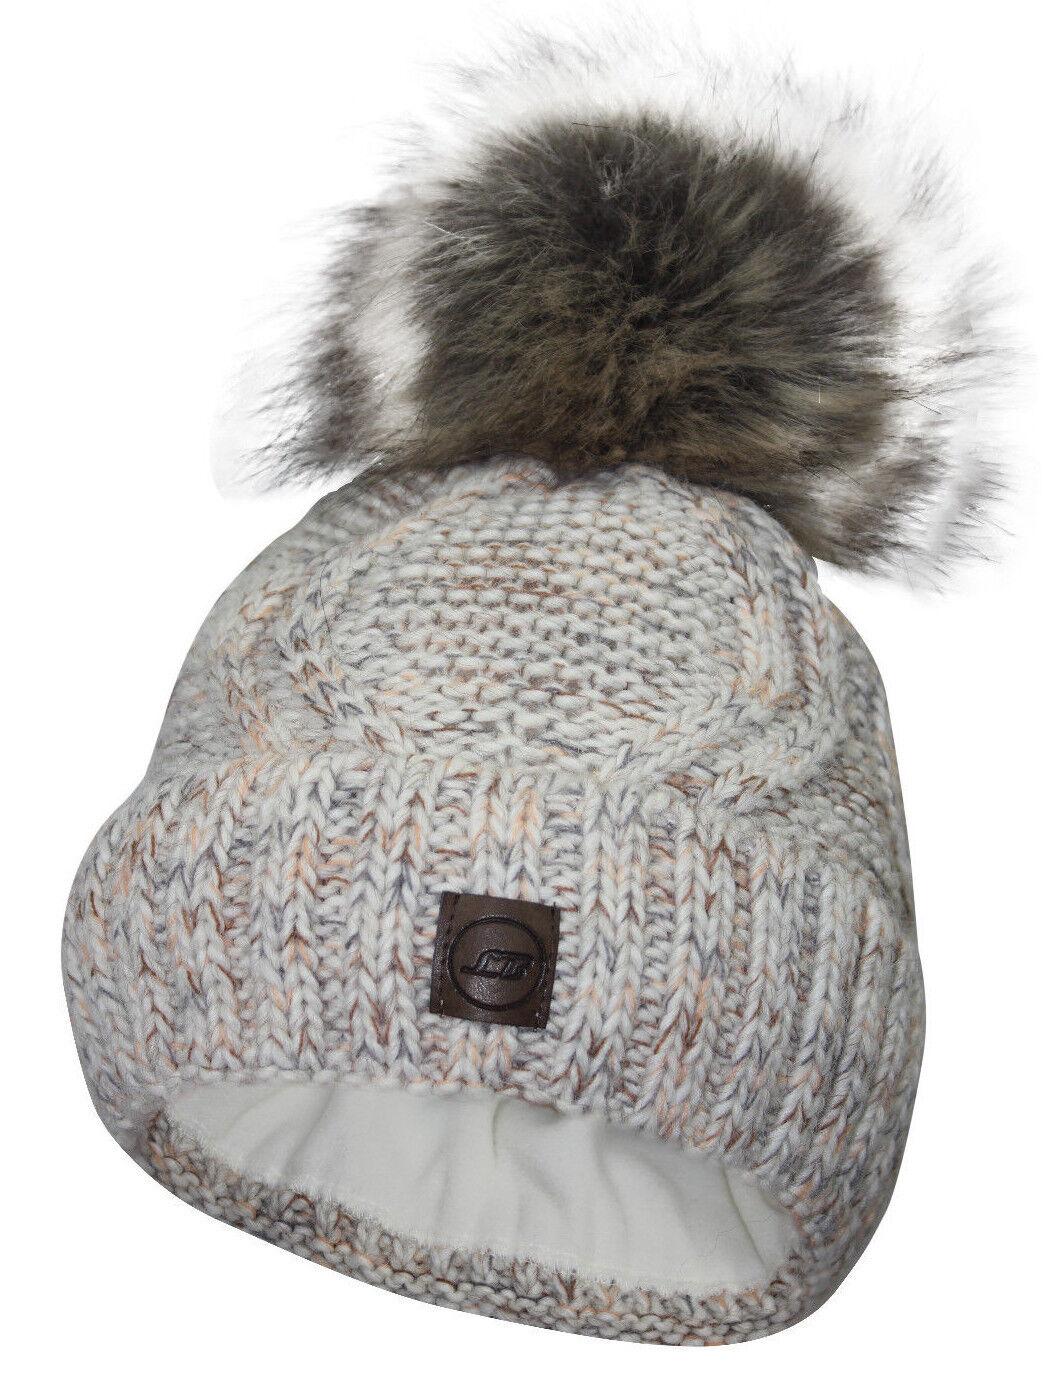 Damen Mütze Bommelmütze Strickmütze Kunstfell Winter  Beanie gefüttert warm TOP